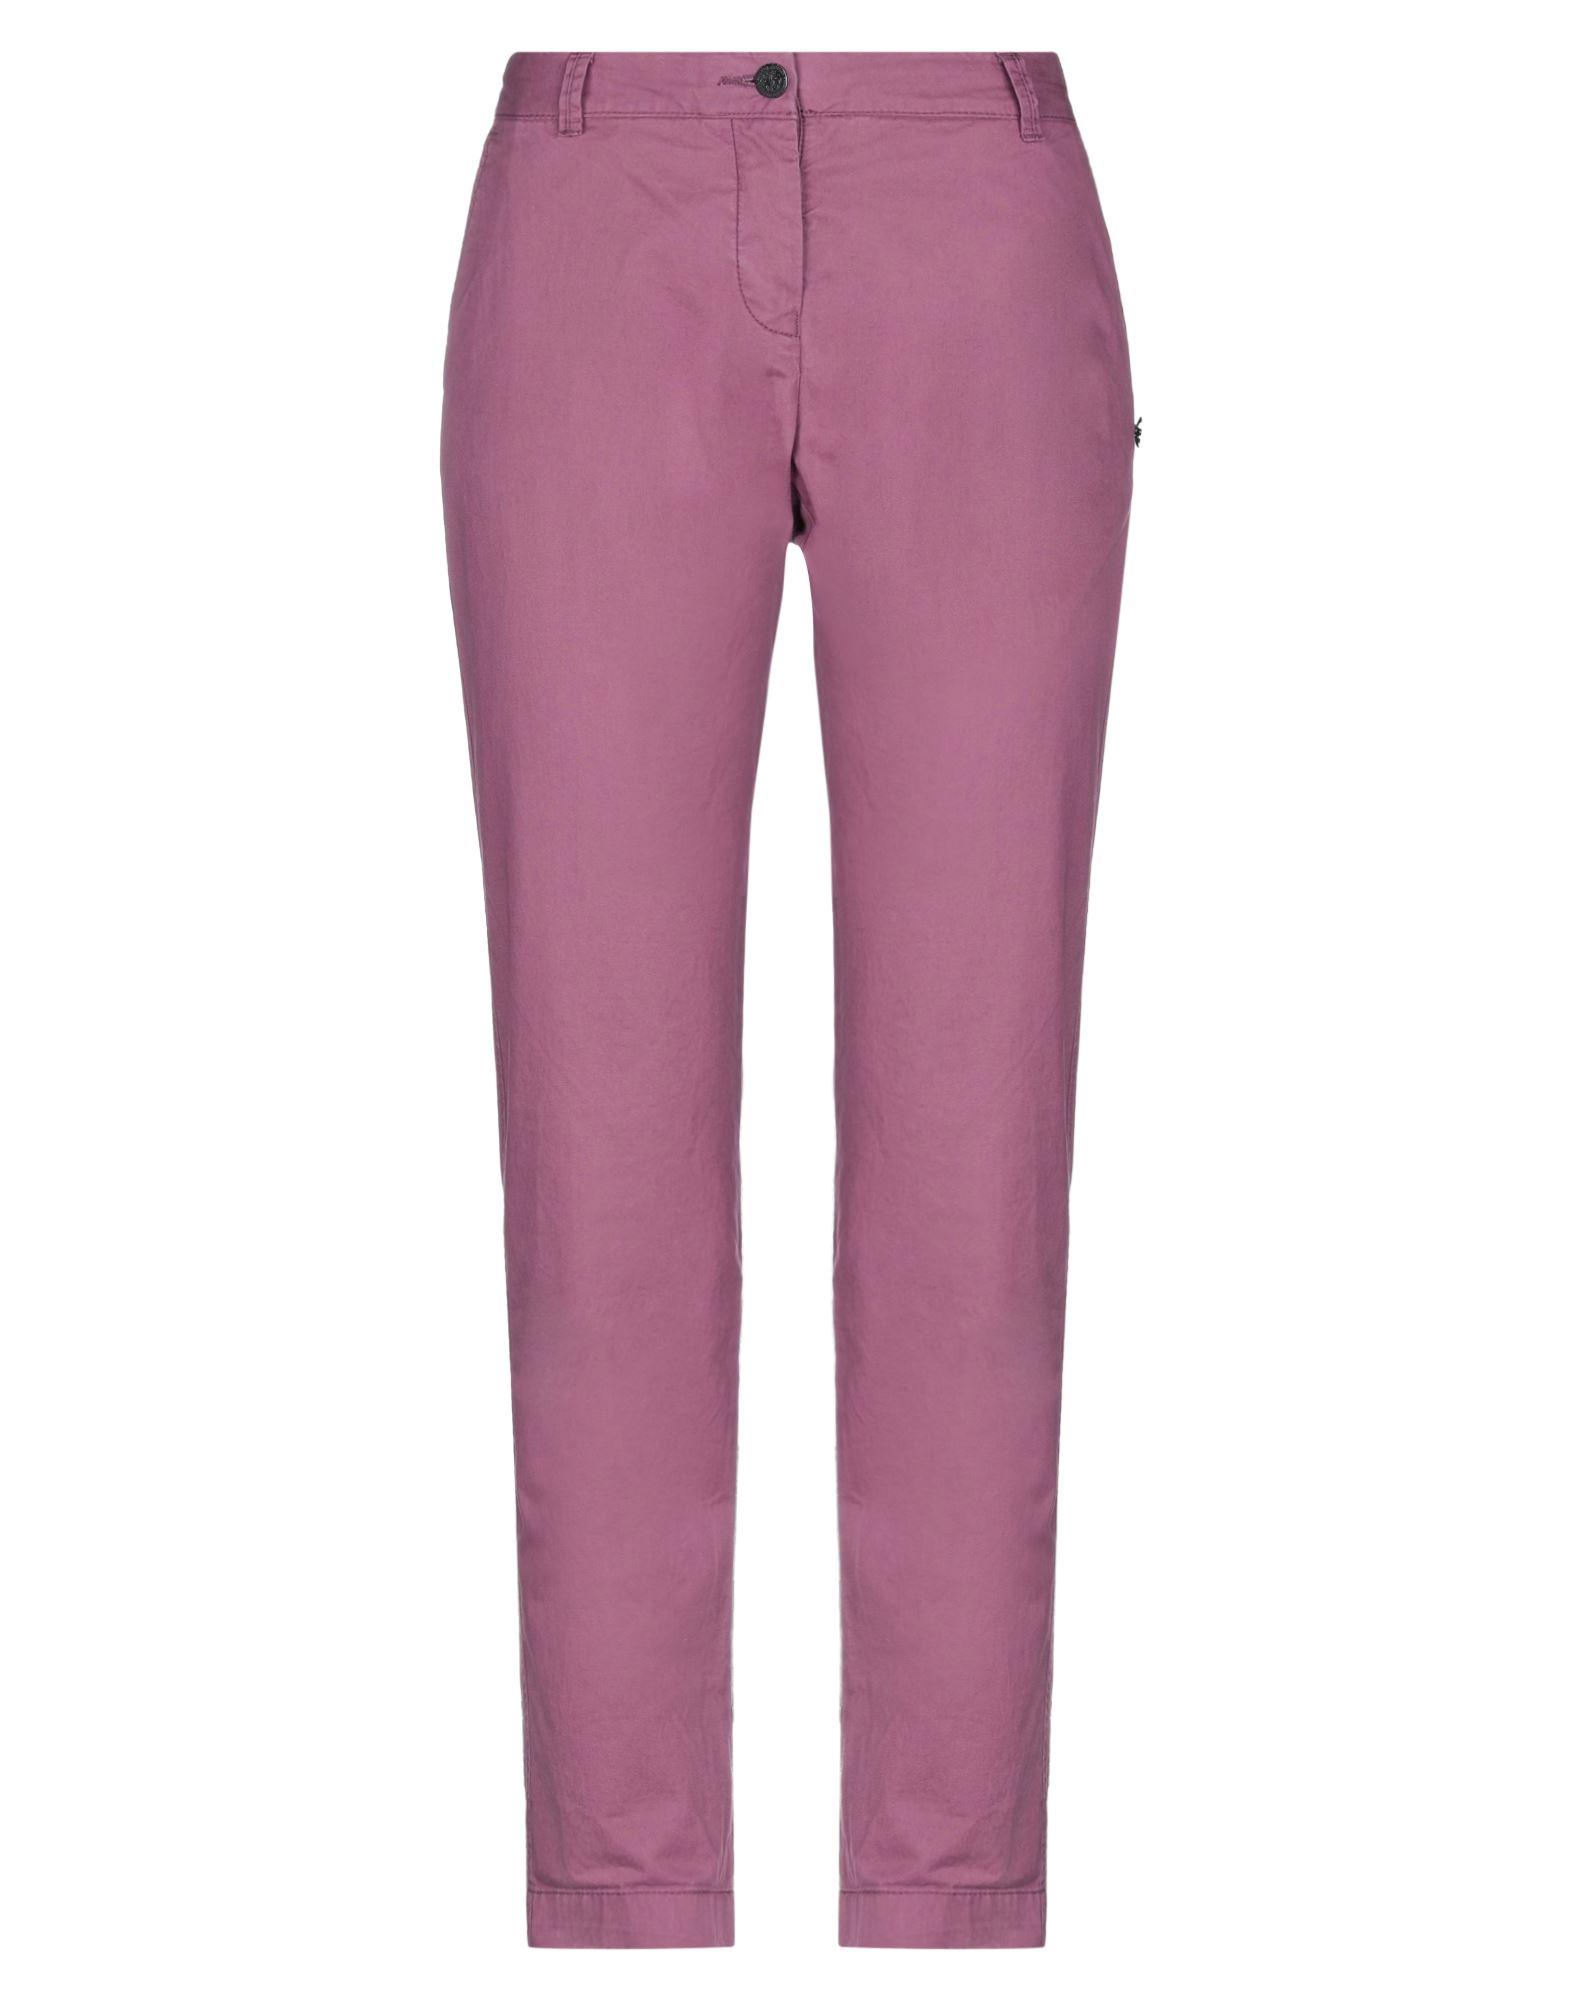 MAISON SCOTCH Повседневные брюки good mood повседневные брюки